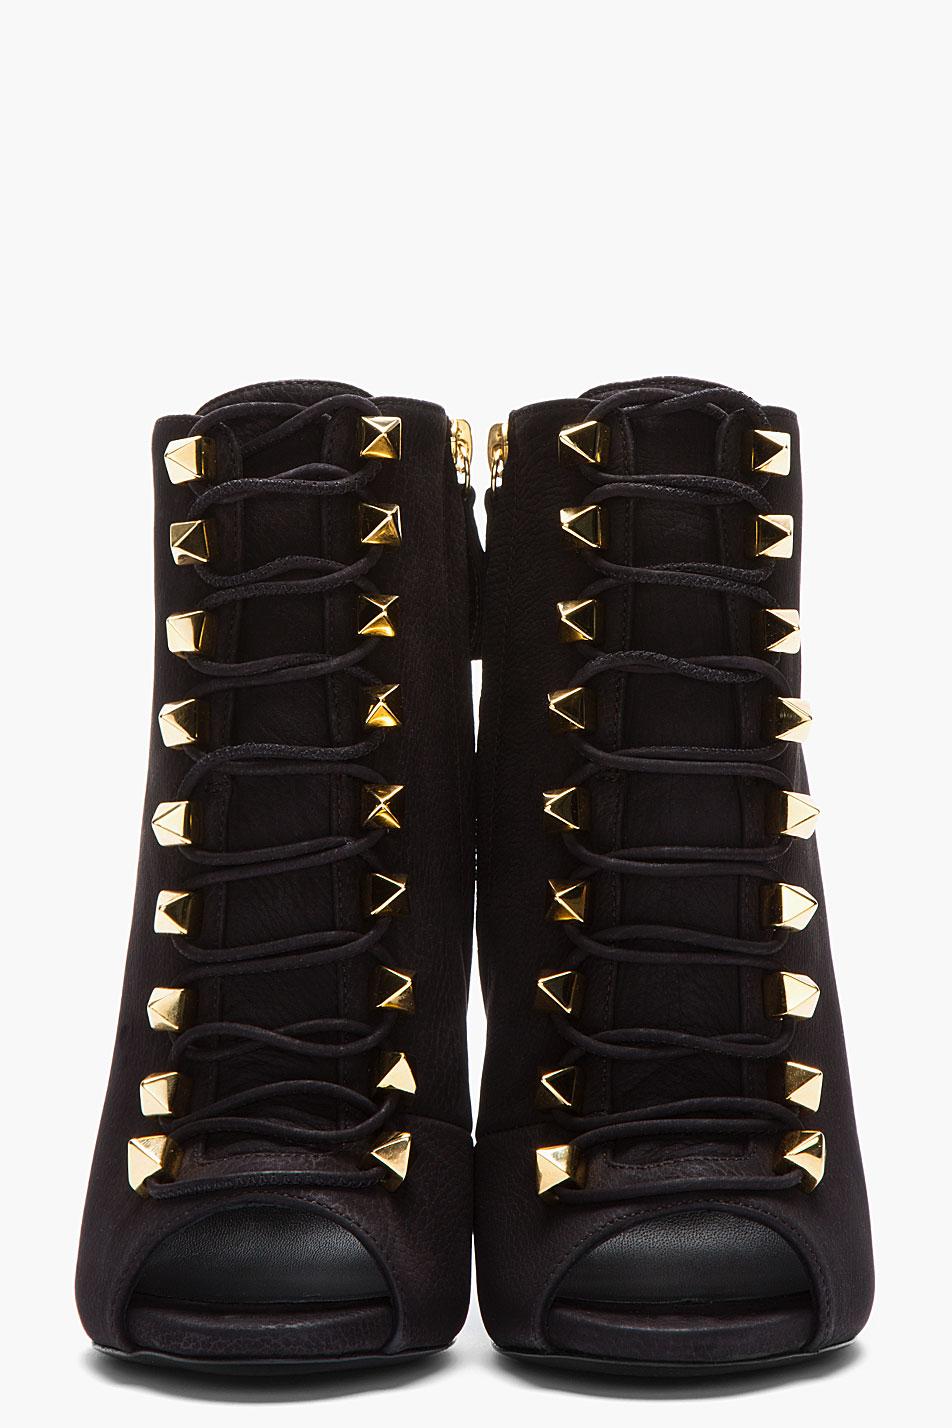 Lyst - Giuseppe Zanotti Matte Black Leather Goldstudded Alien Boots in Black